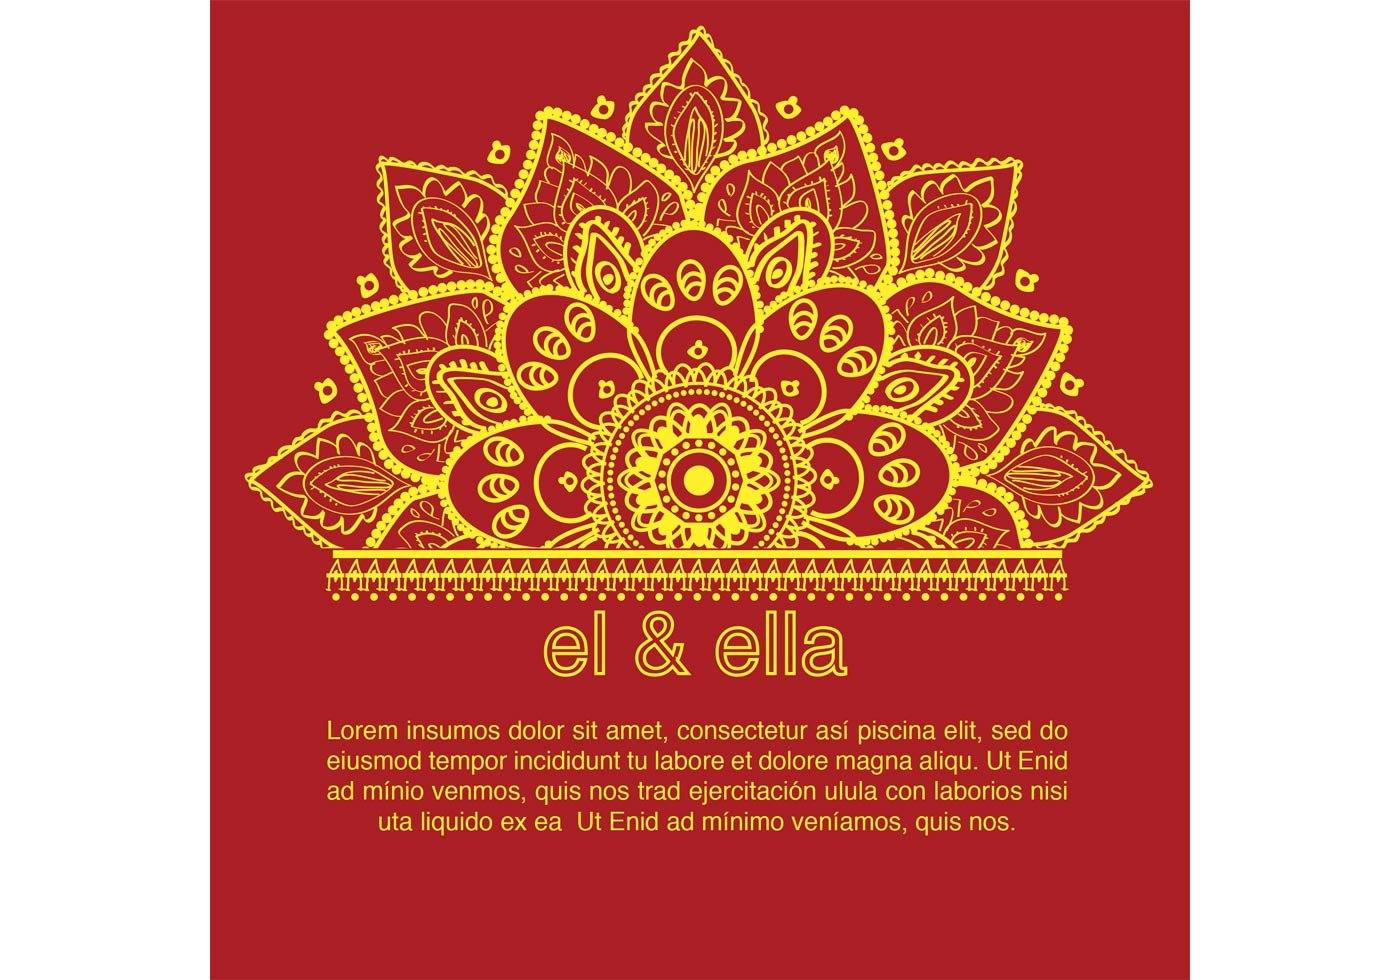 Indian Wedding Card Template  Download Free Vector Art Stock Inside Indian Wedding Cards Design Templates